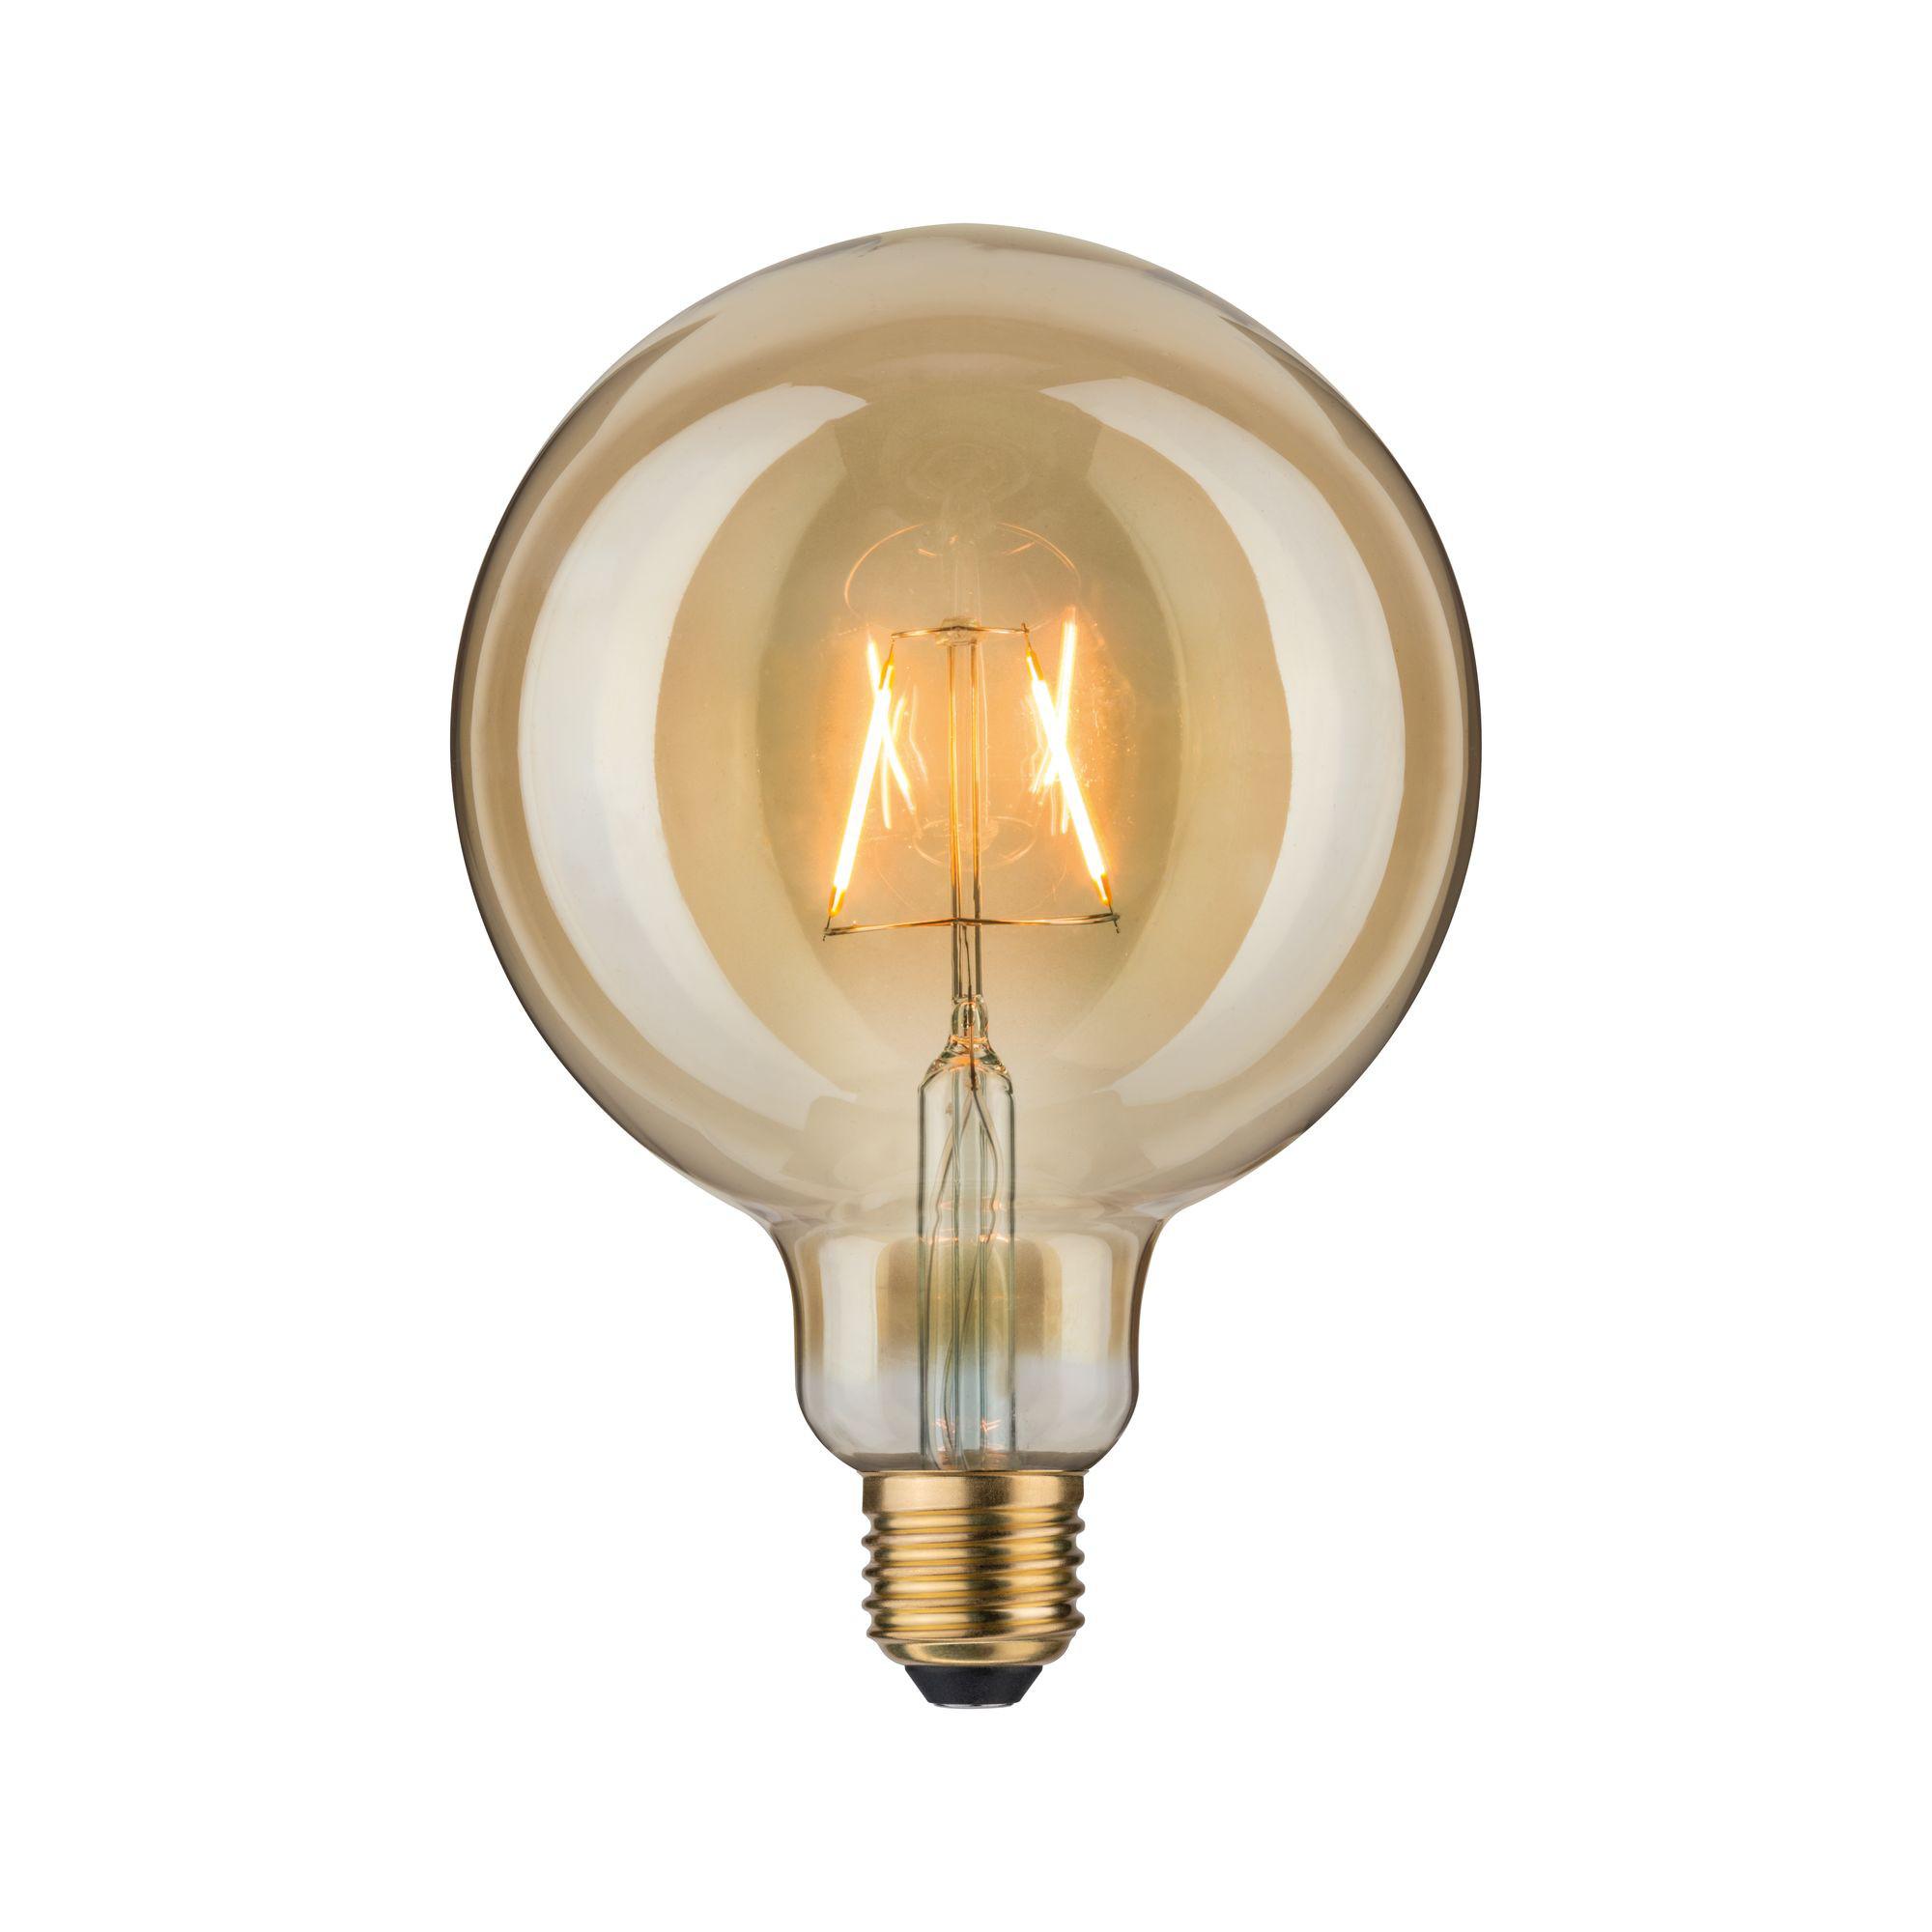 Лампа филаментная Paulmann Шар G125 2.5Вт 170лм 1700К Е27 230В Золото 28379.